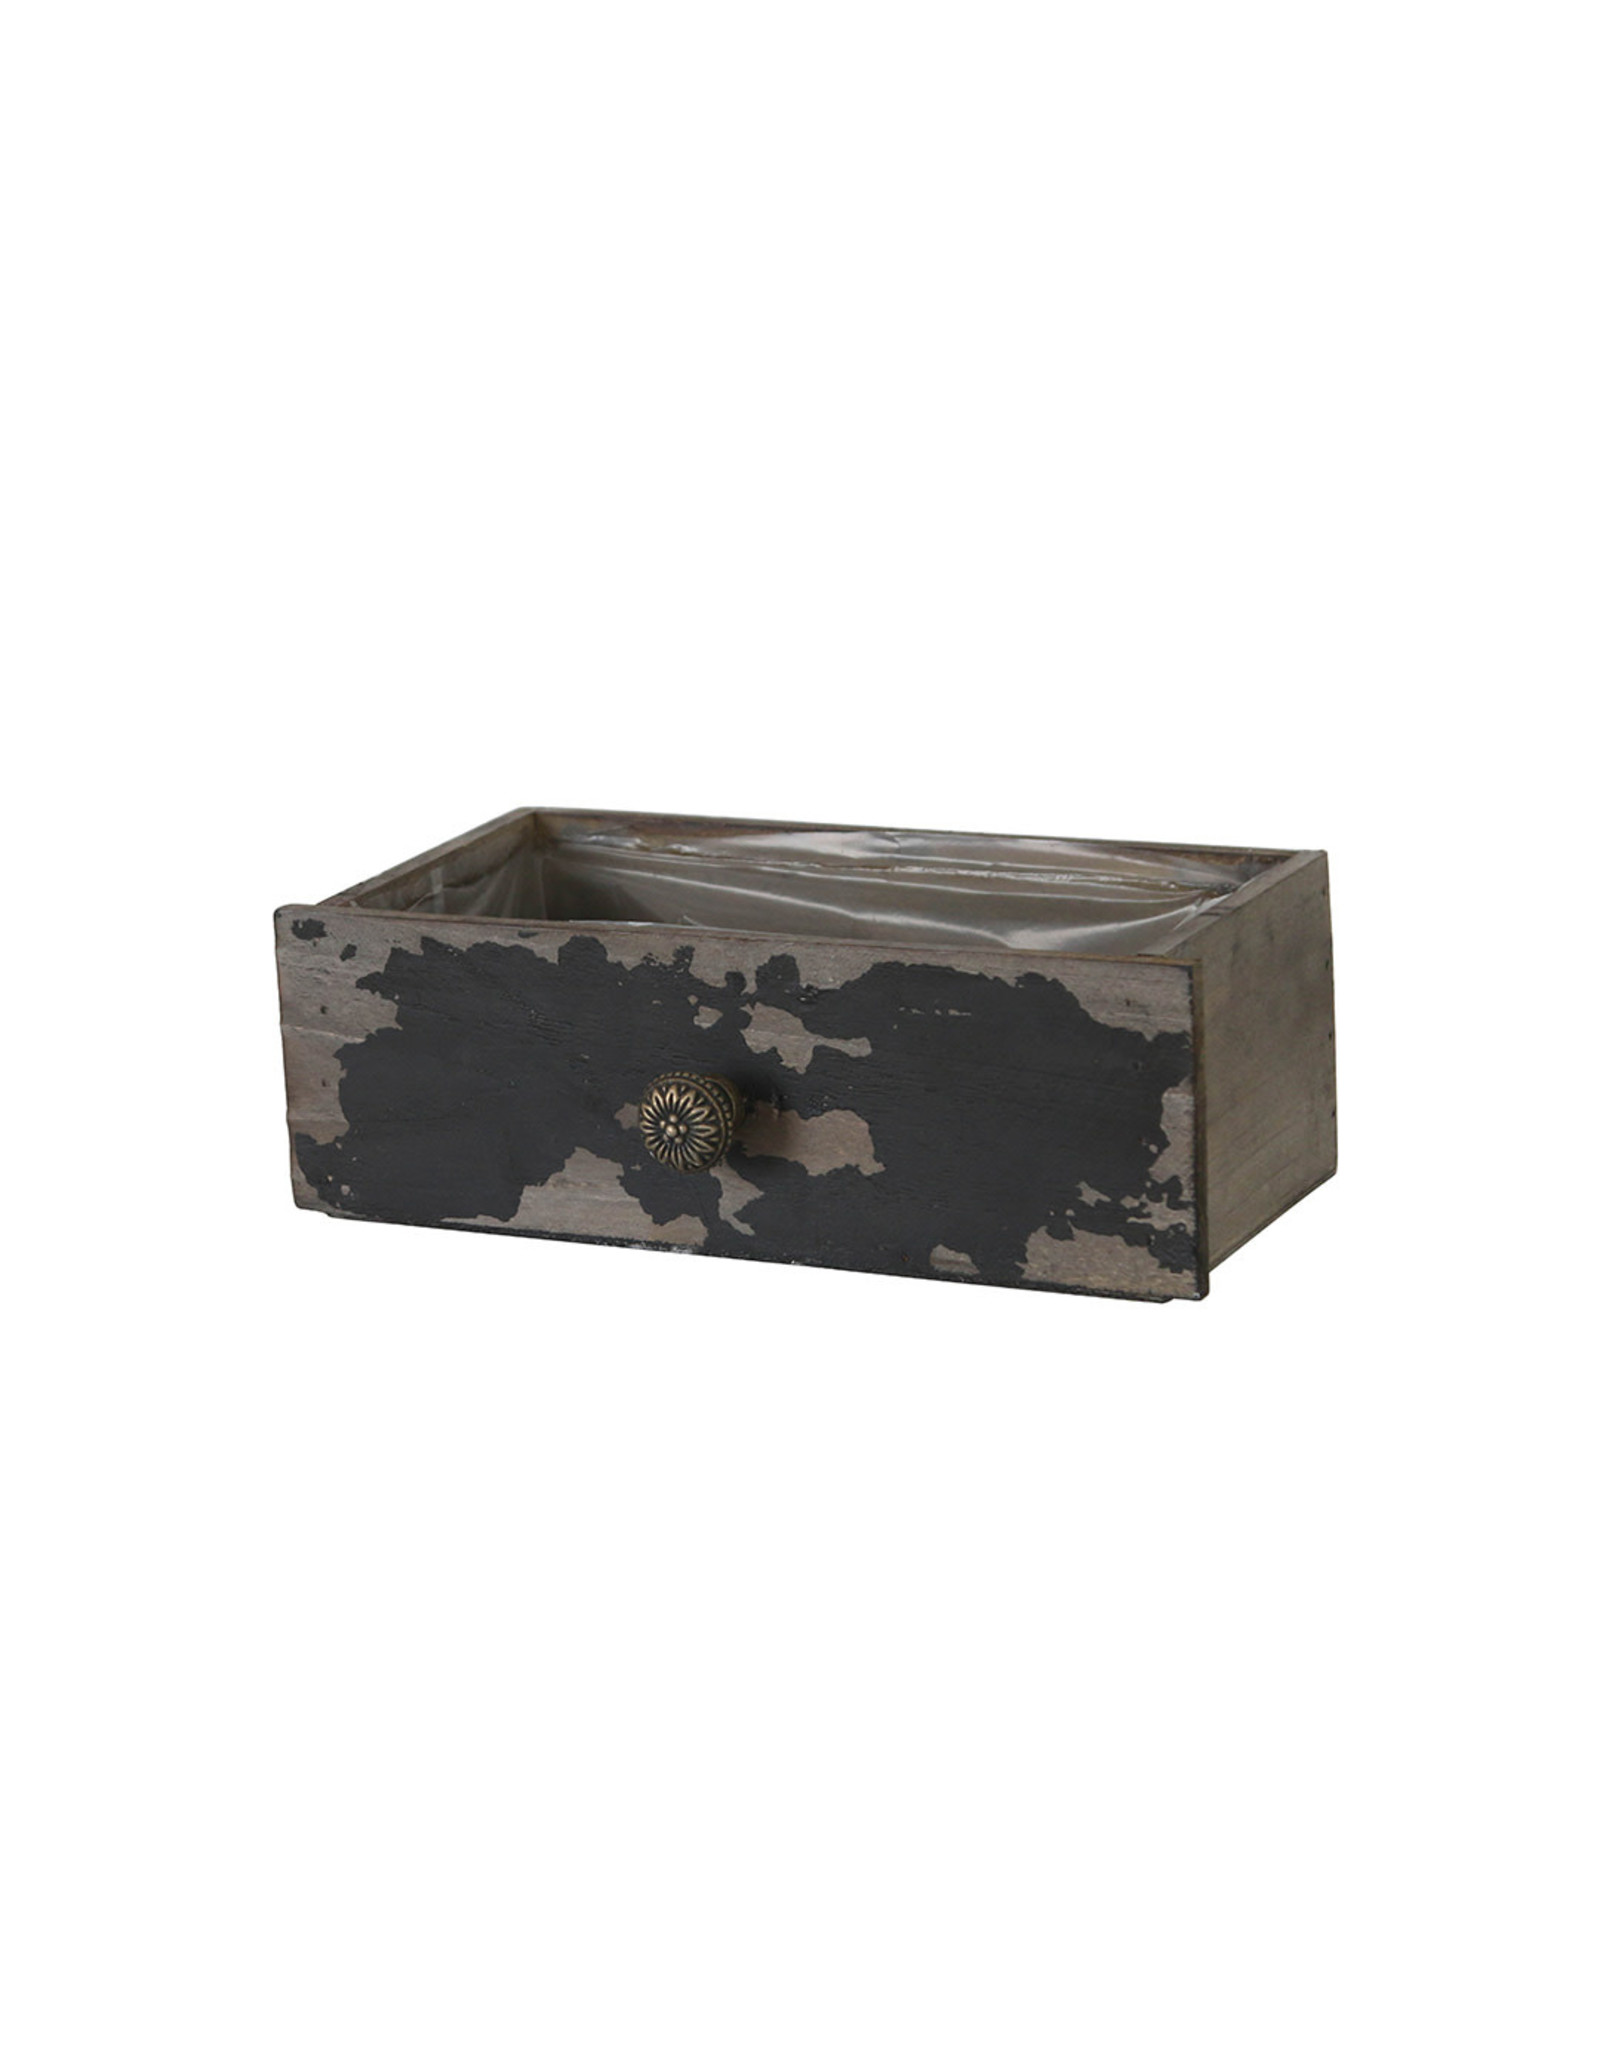 Dijk Drawer planter wood antique black 27/25x12.5x9cm